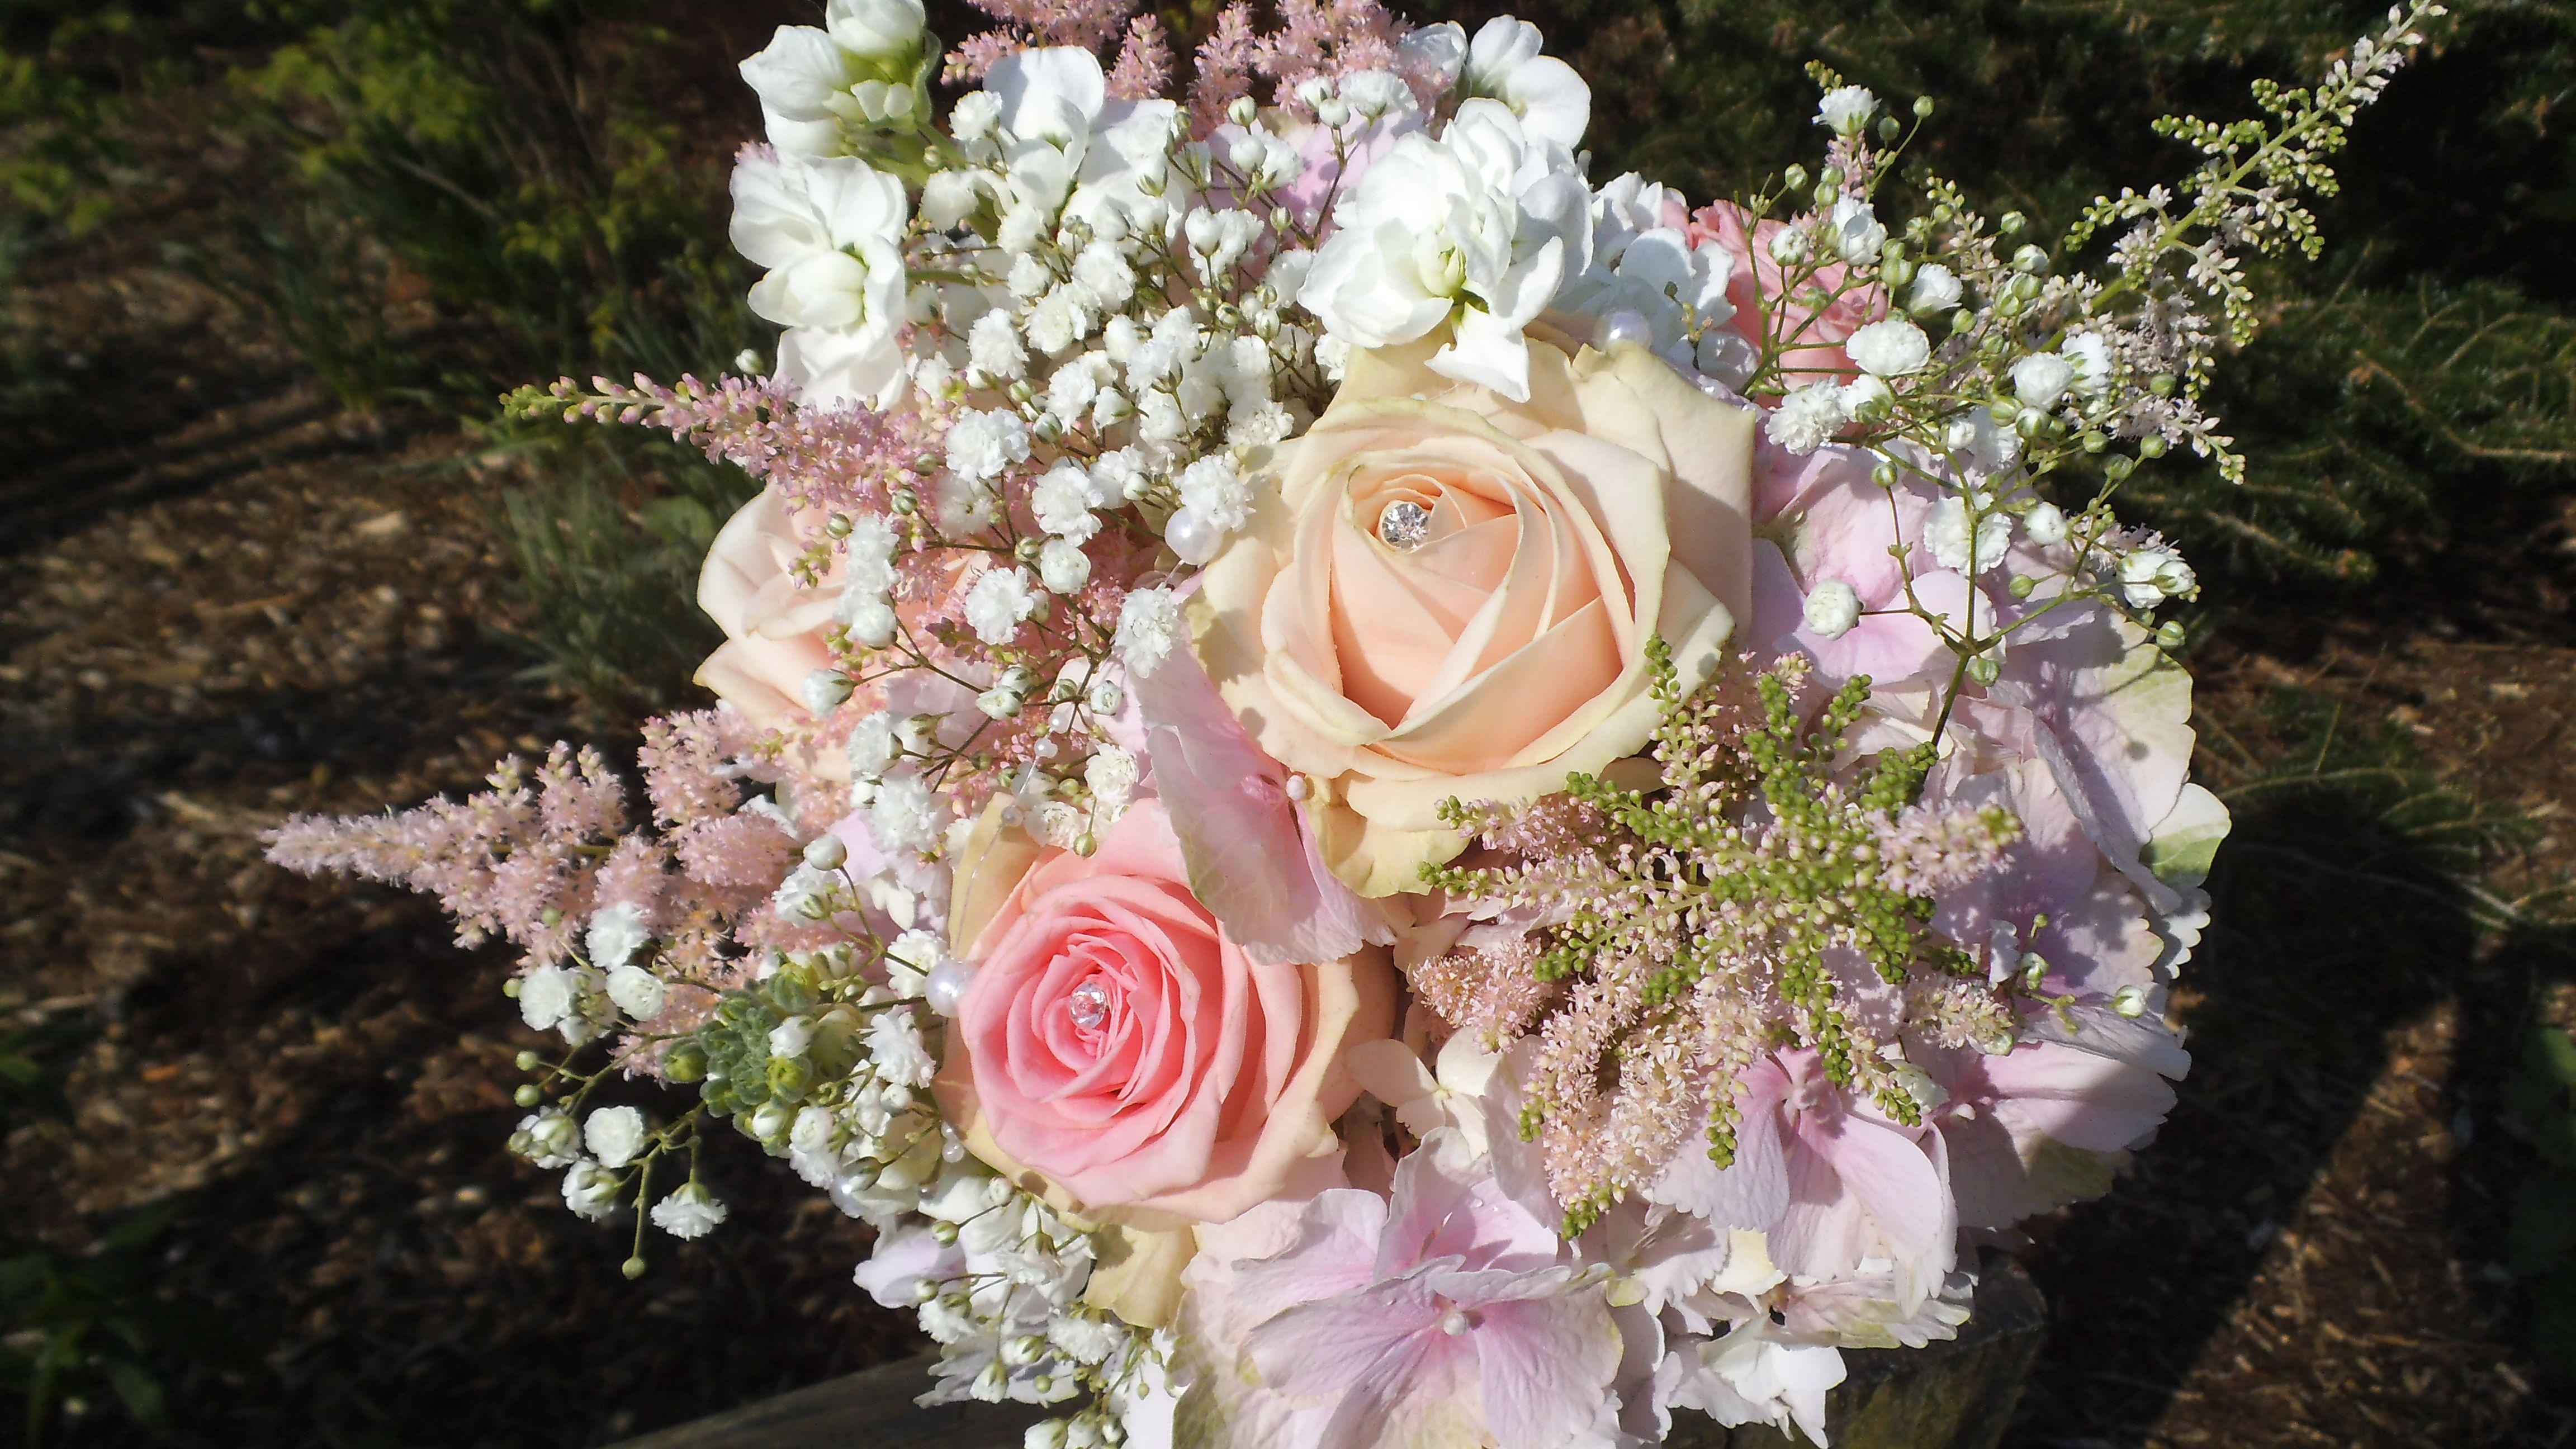 roses flowers gypsophila flower - photo #7